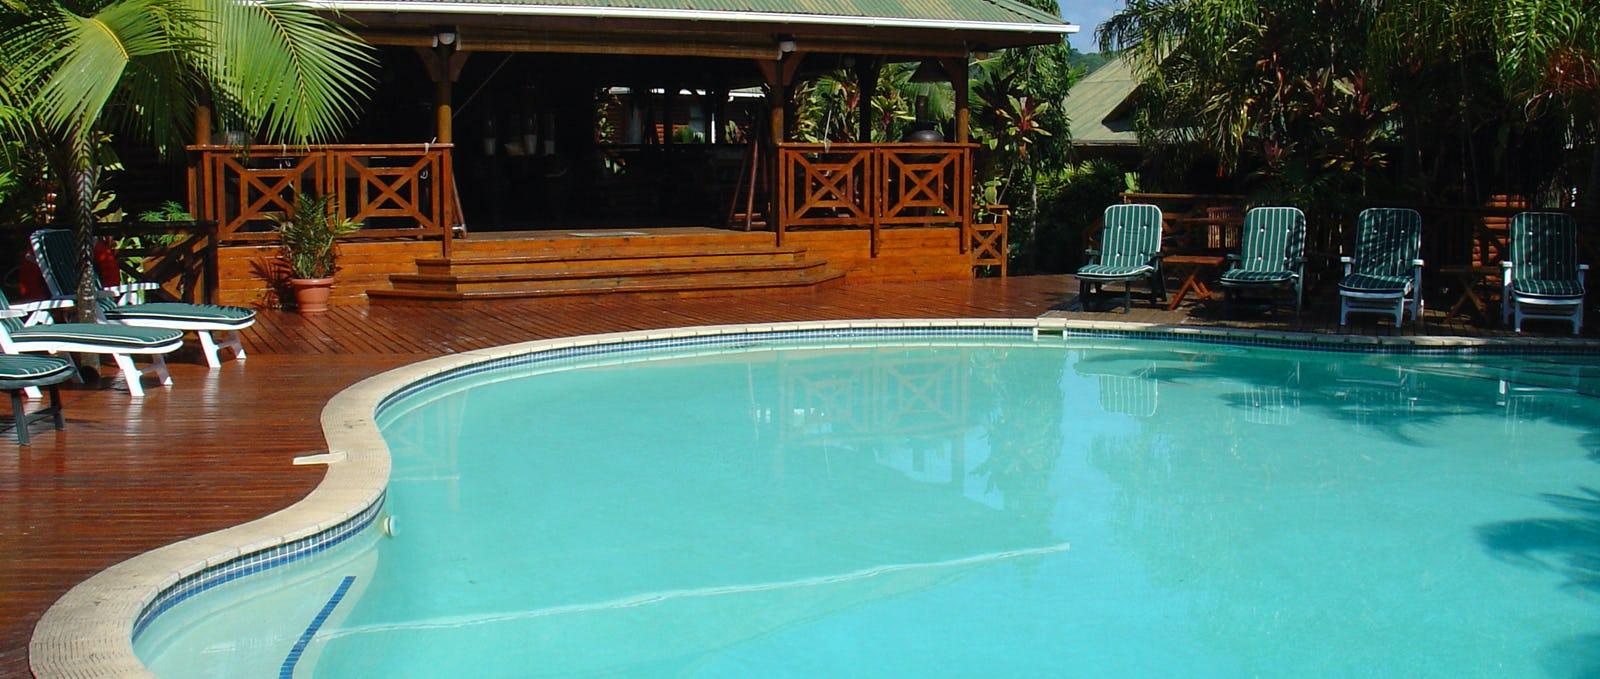 Le jardin des palmes hotel seychelles timbuktu travel for Pool designs under 50 000